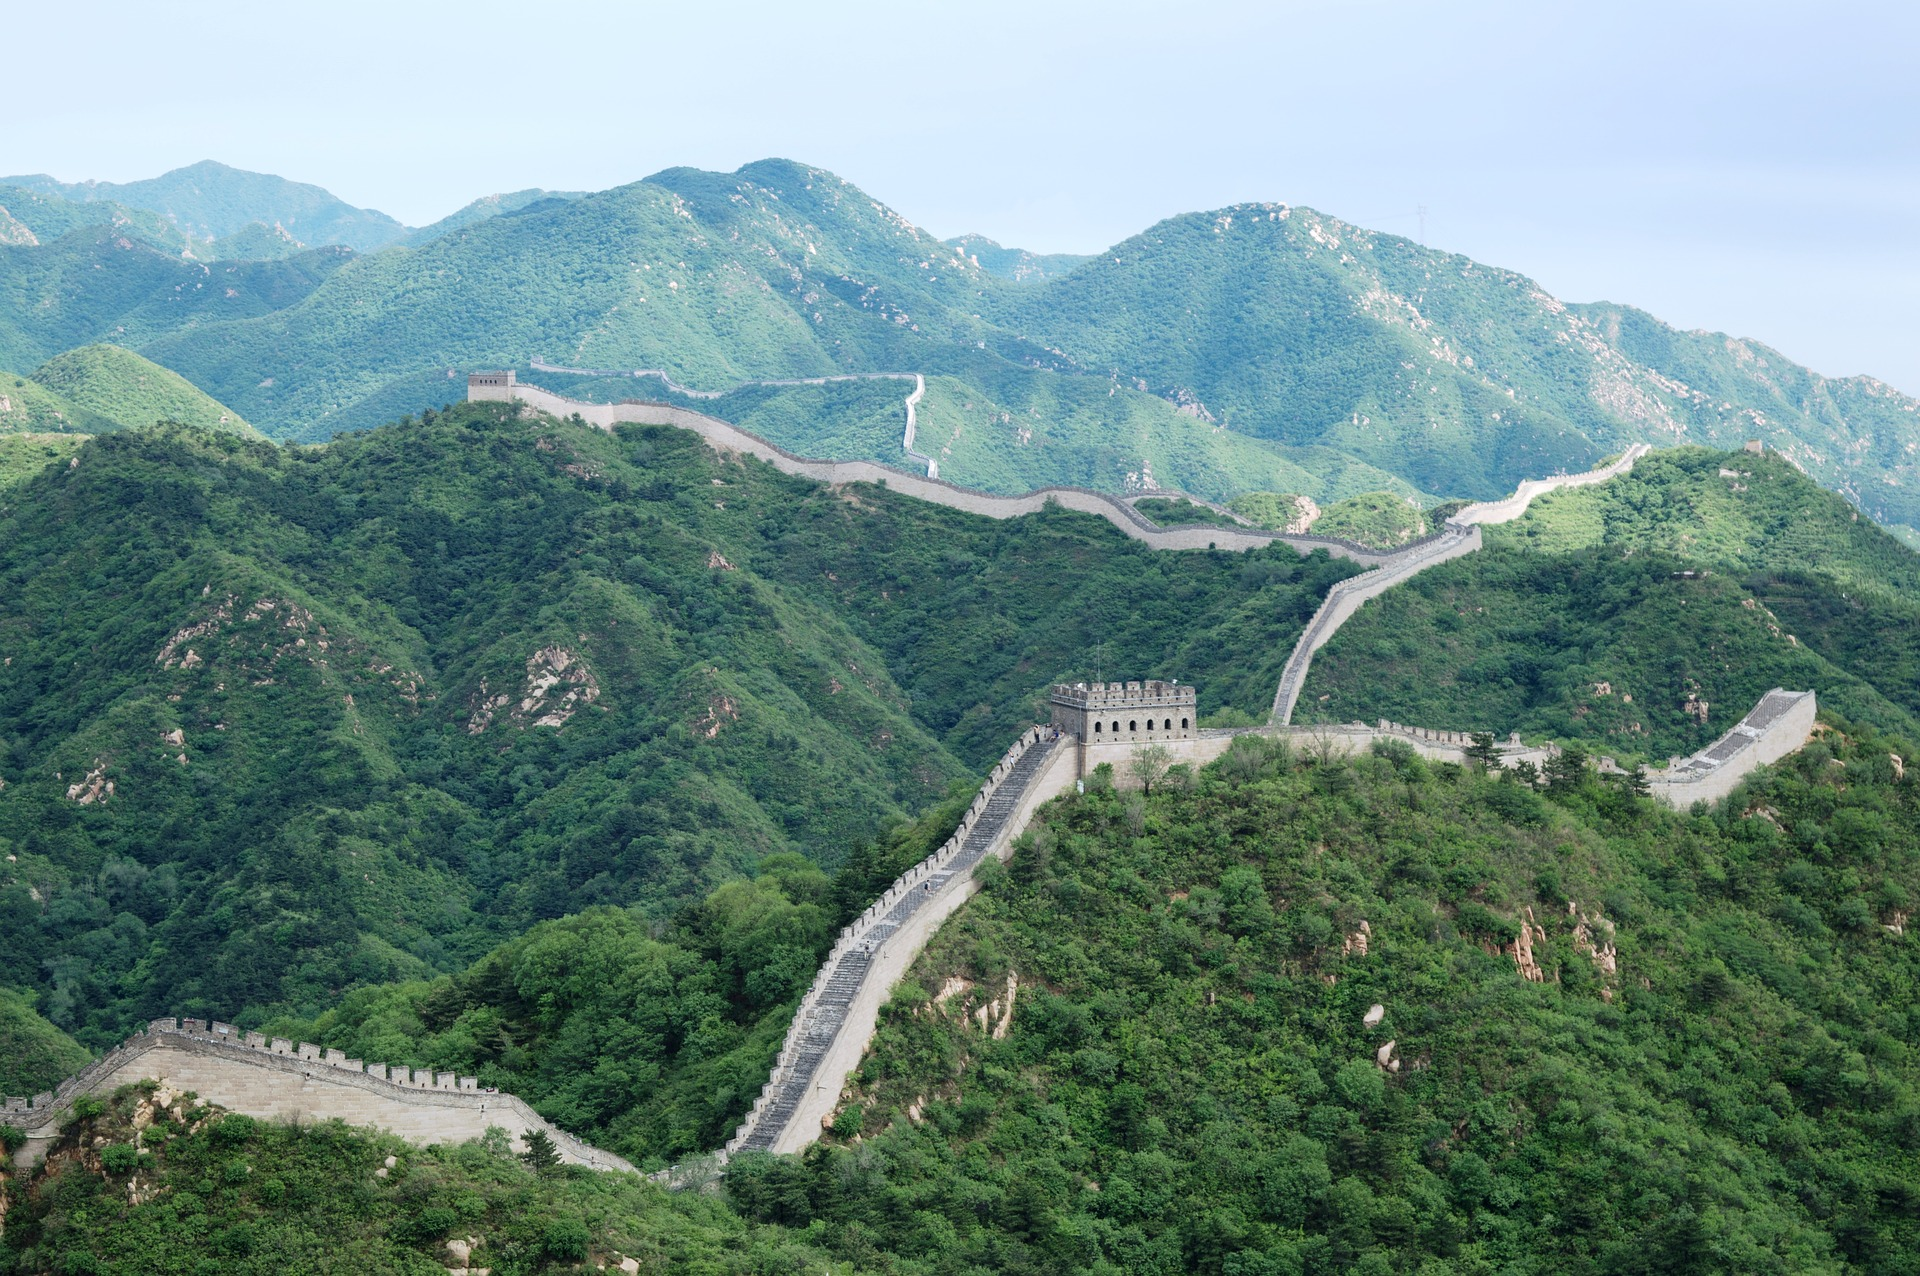 murailles de chine